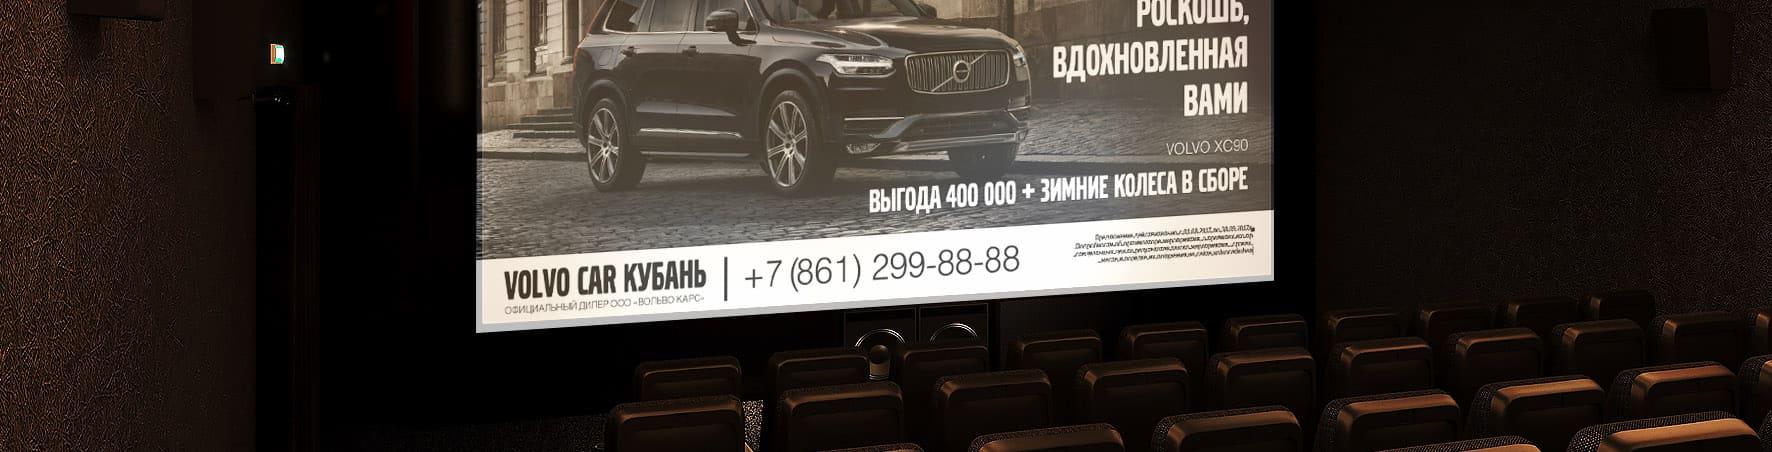 Реклама в кинотеатре видеореклама